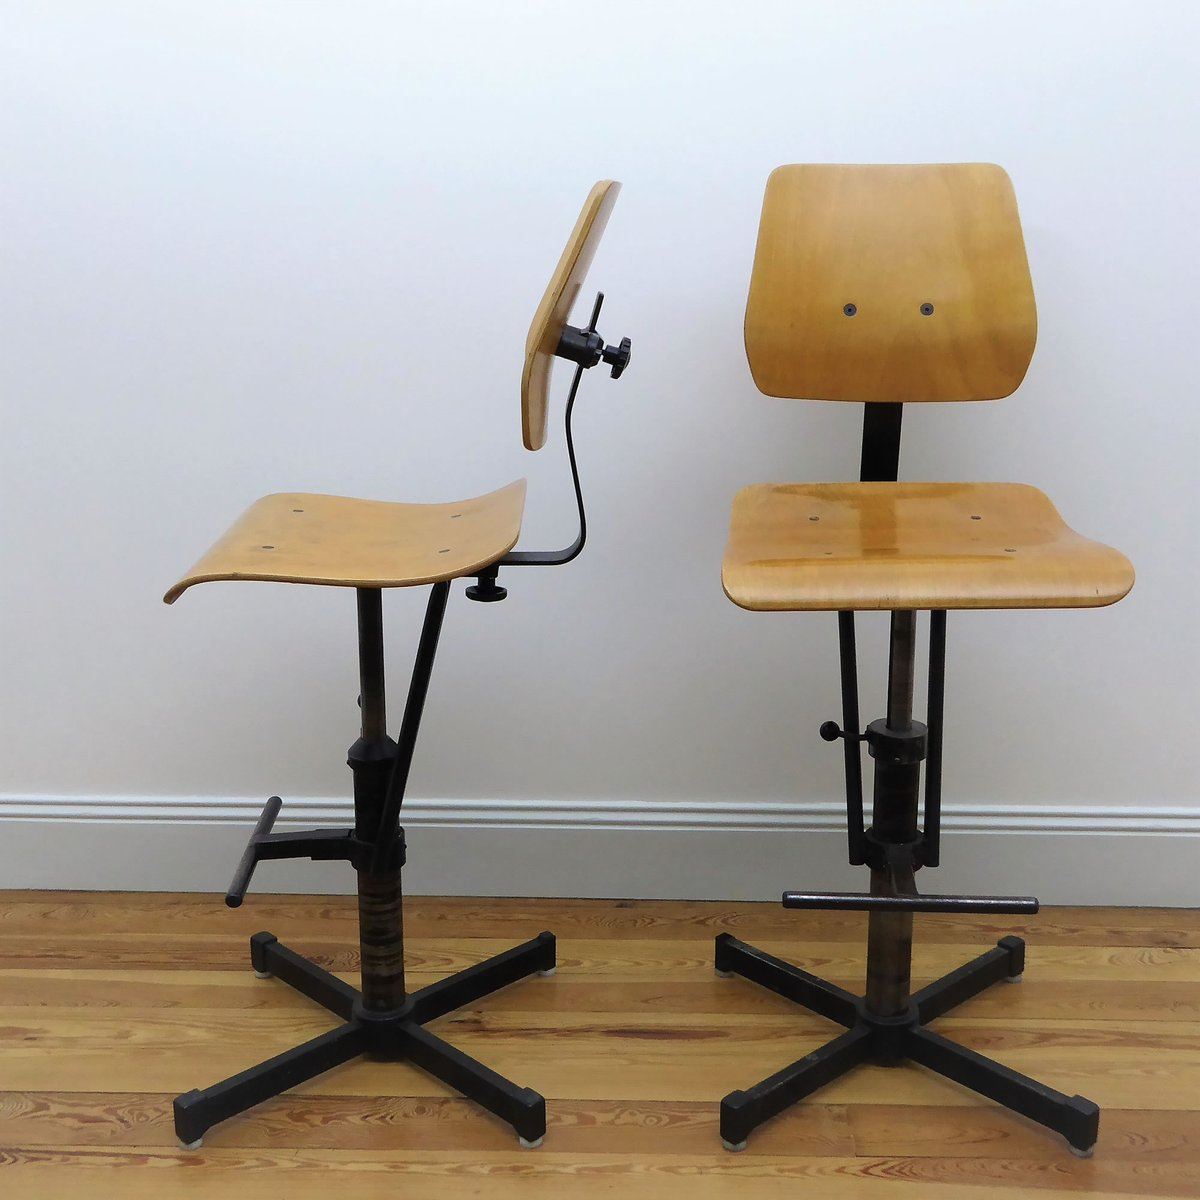 industrielle hohe st hle aus buche metall 1960er 2er set bei pamono kaufen. Black Bedroom Furniture Sets. Home Design Ideas